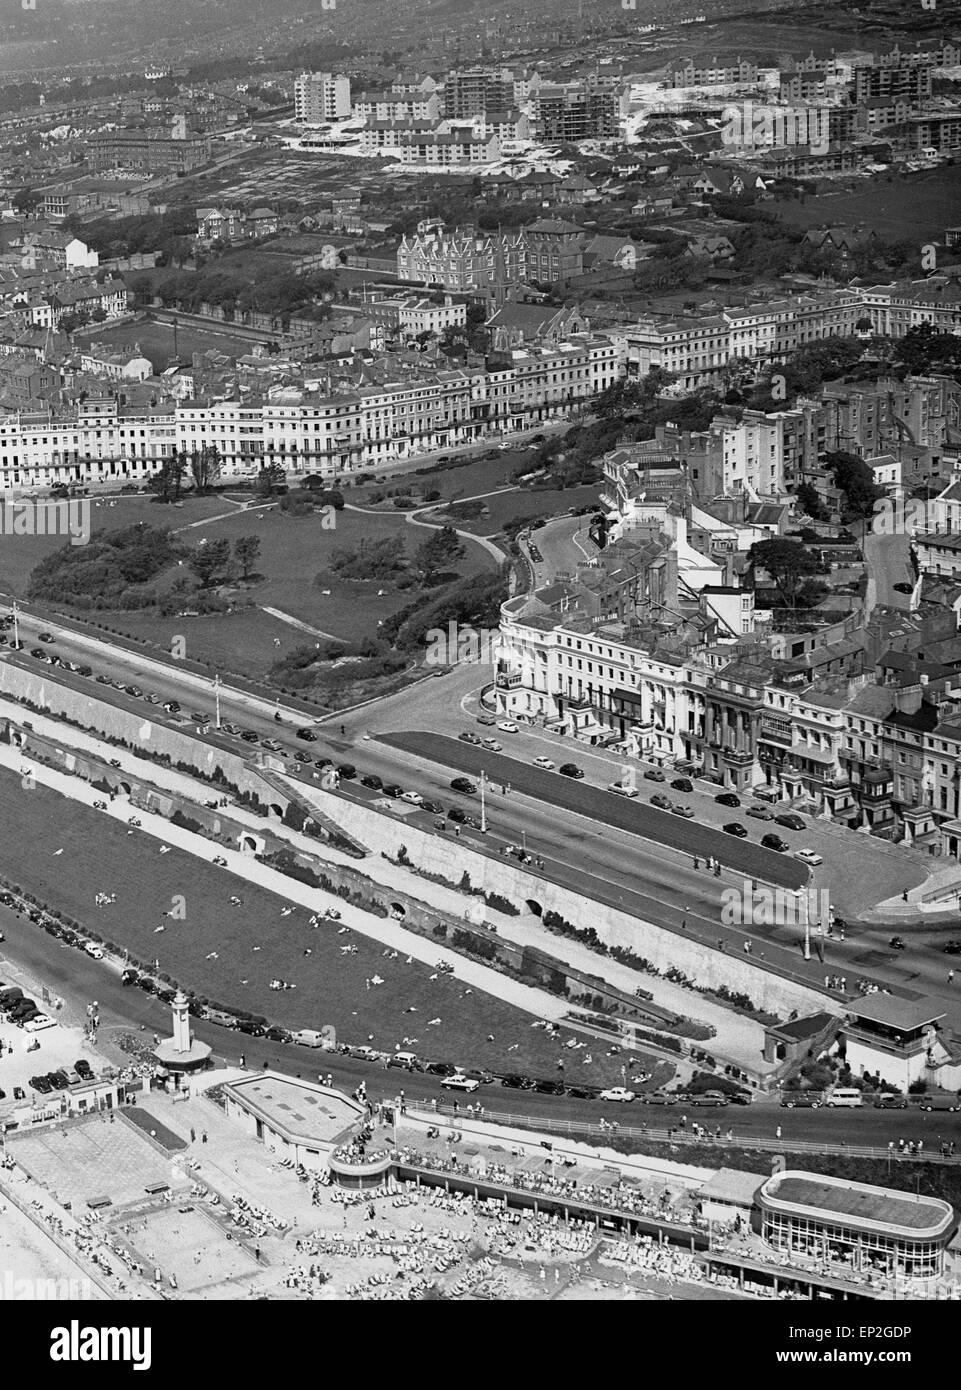 Vor Brighton, East Sussex, 4. August 1957. Stockbild